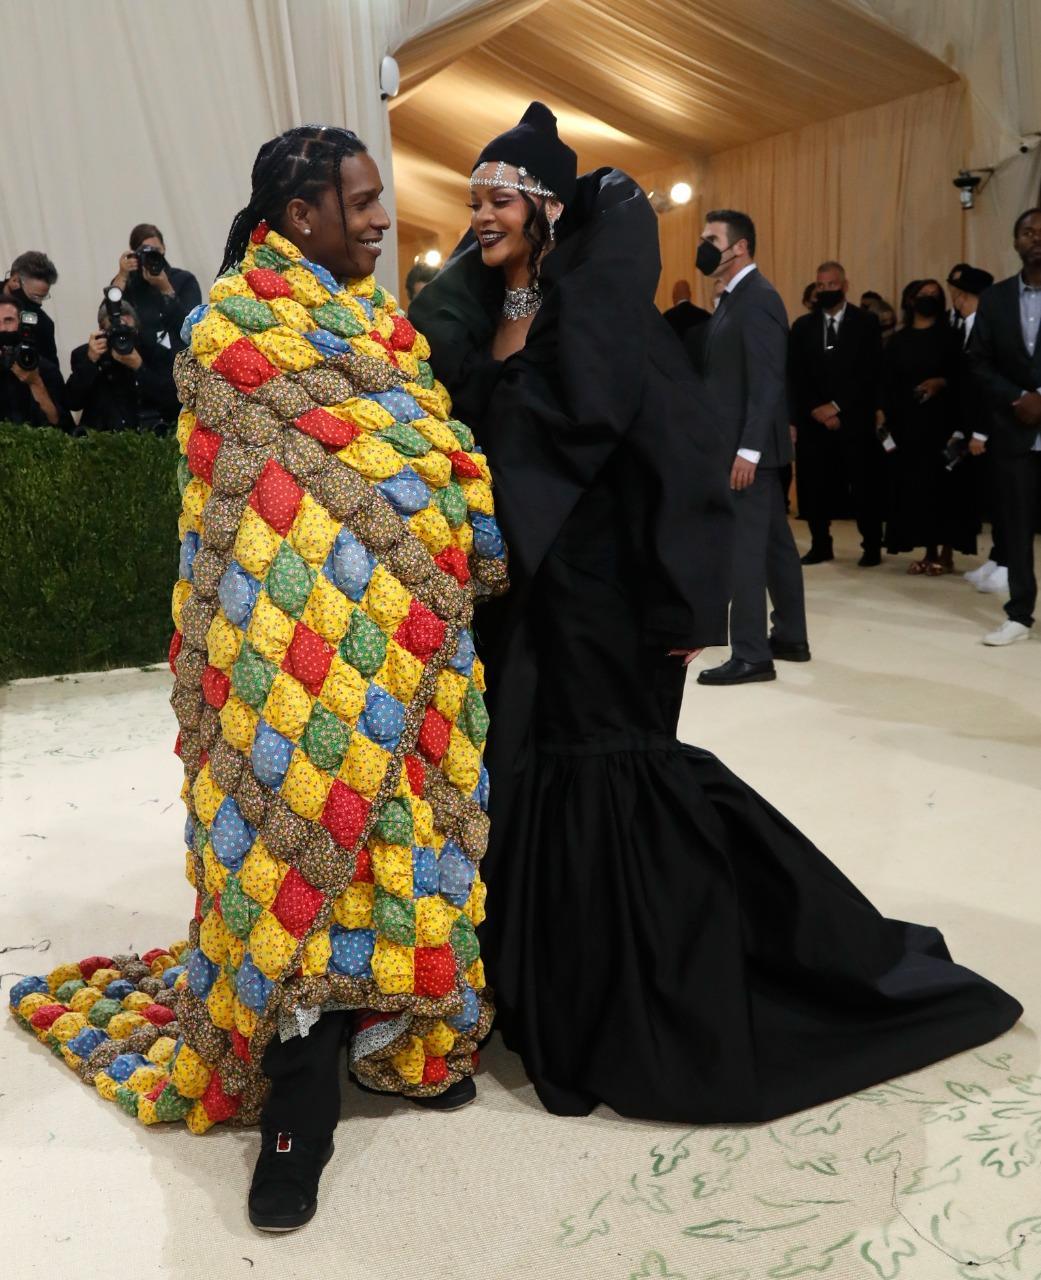 Rihanna's fashionably late entry, Lil Nas X's gold armor, Alexandria Ocasio-Cortez's statement attire… Met Gala 2021 was a glam show